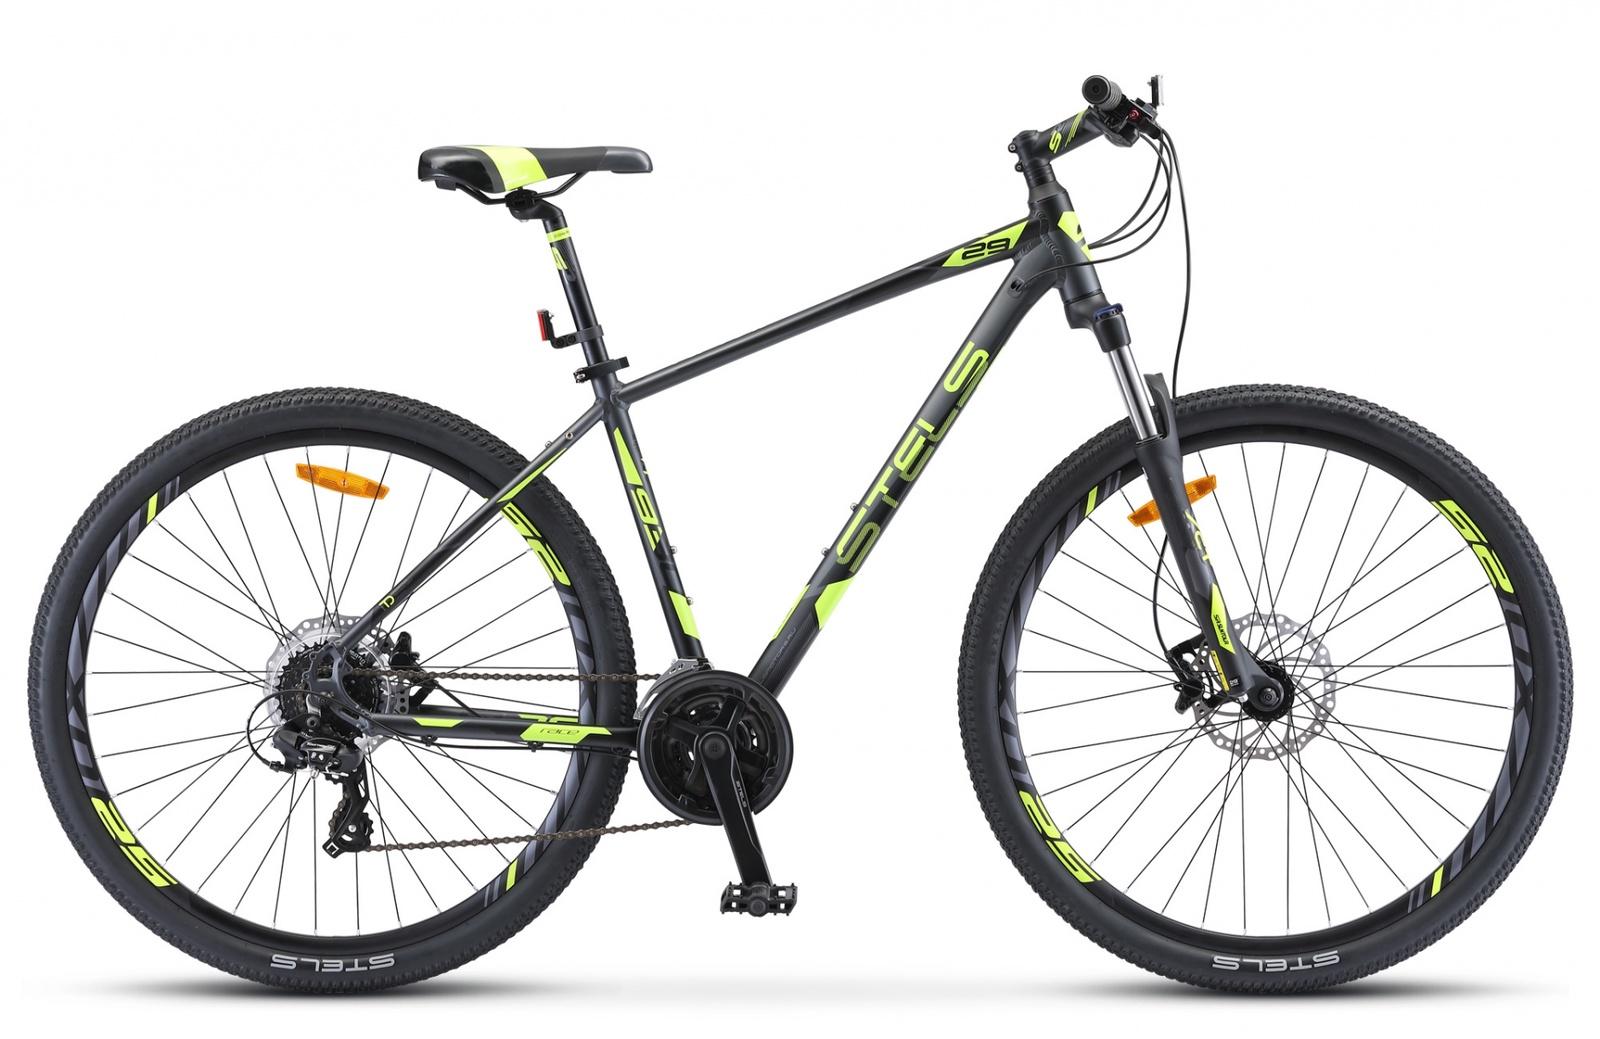 цена на Велосипед Navigator 930 D 29 V010 (2019), рама 16,5 дюймов